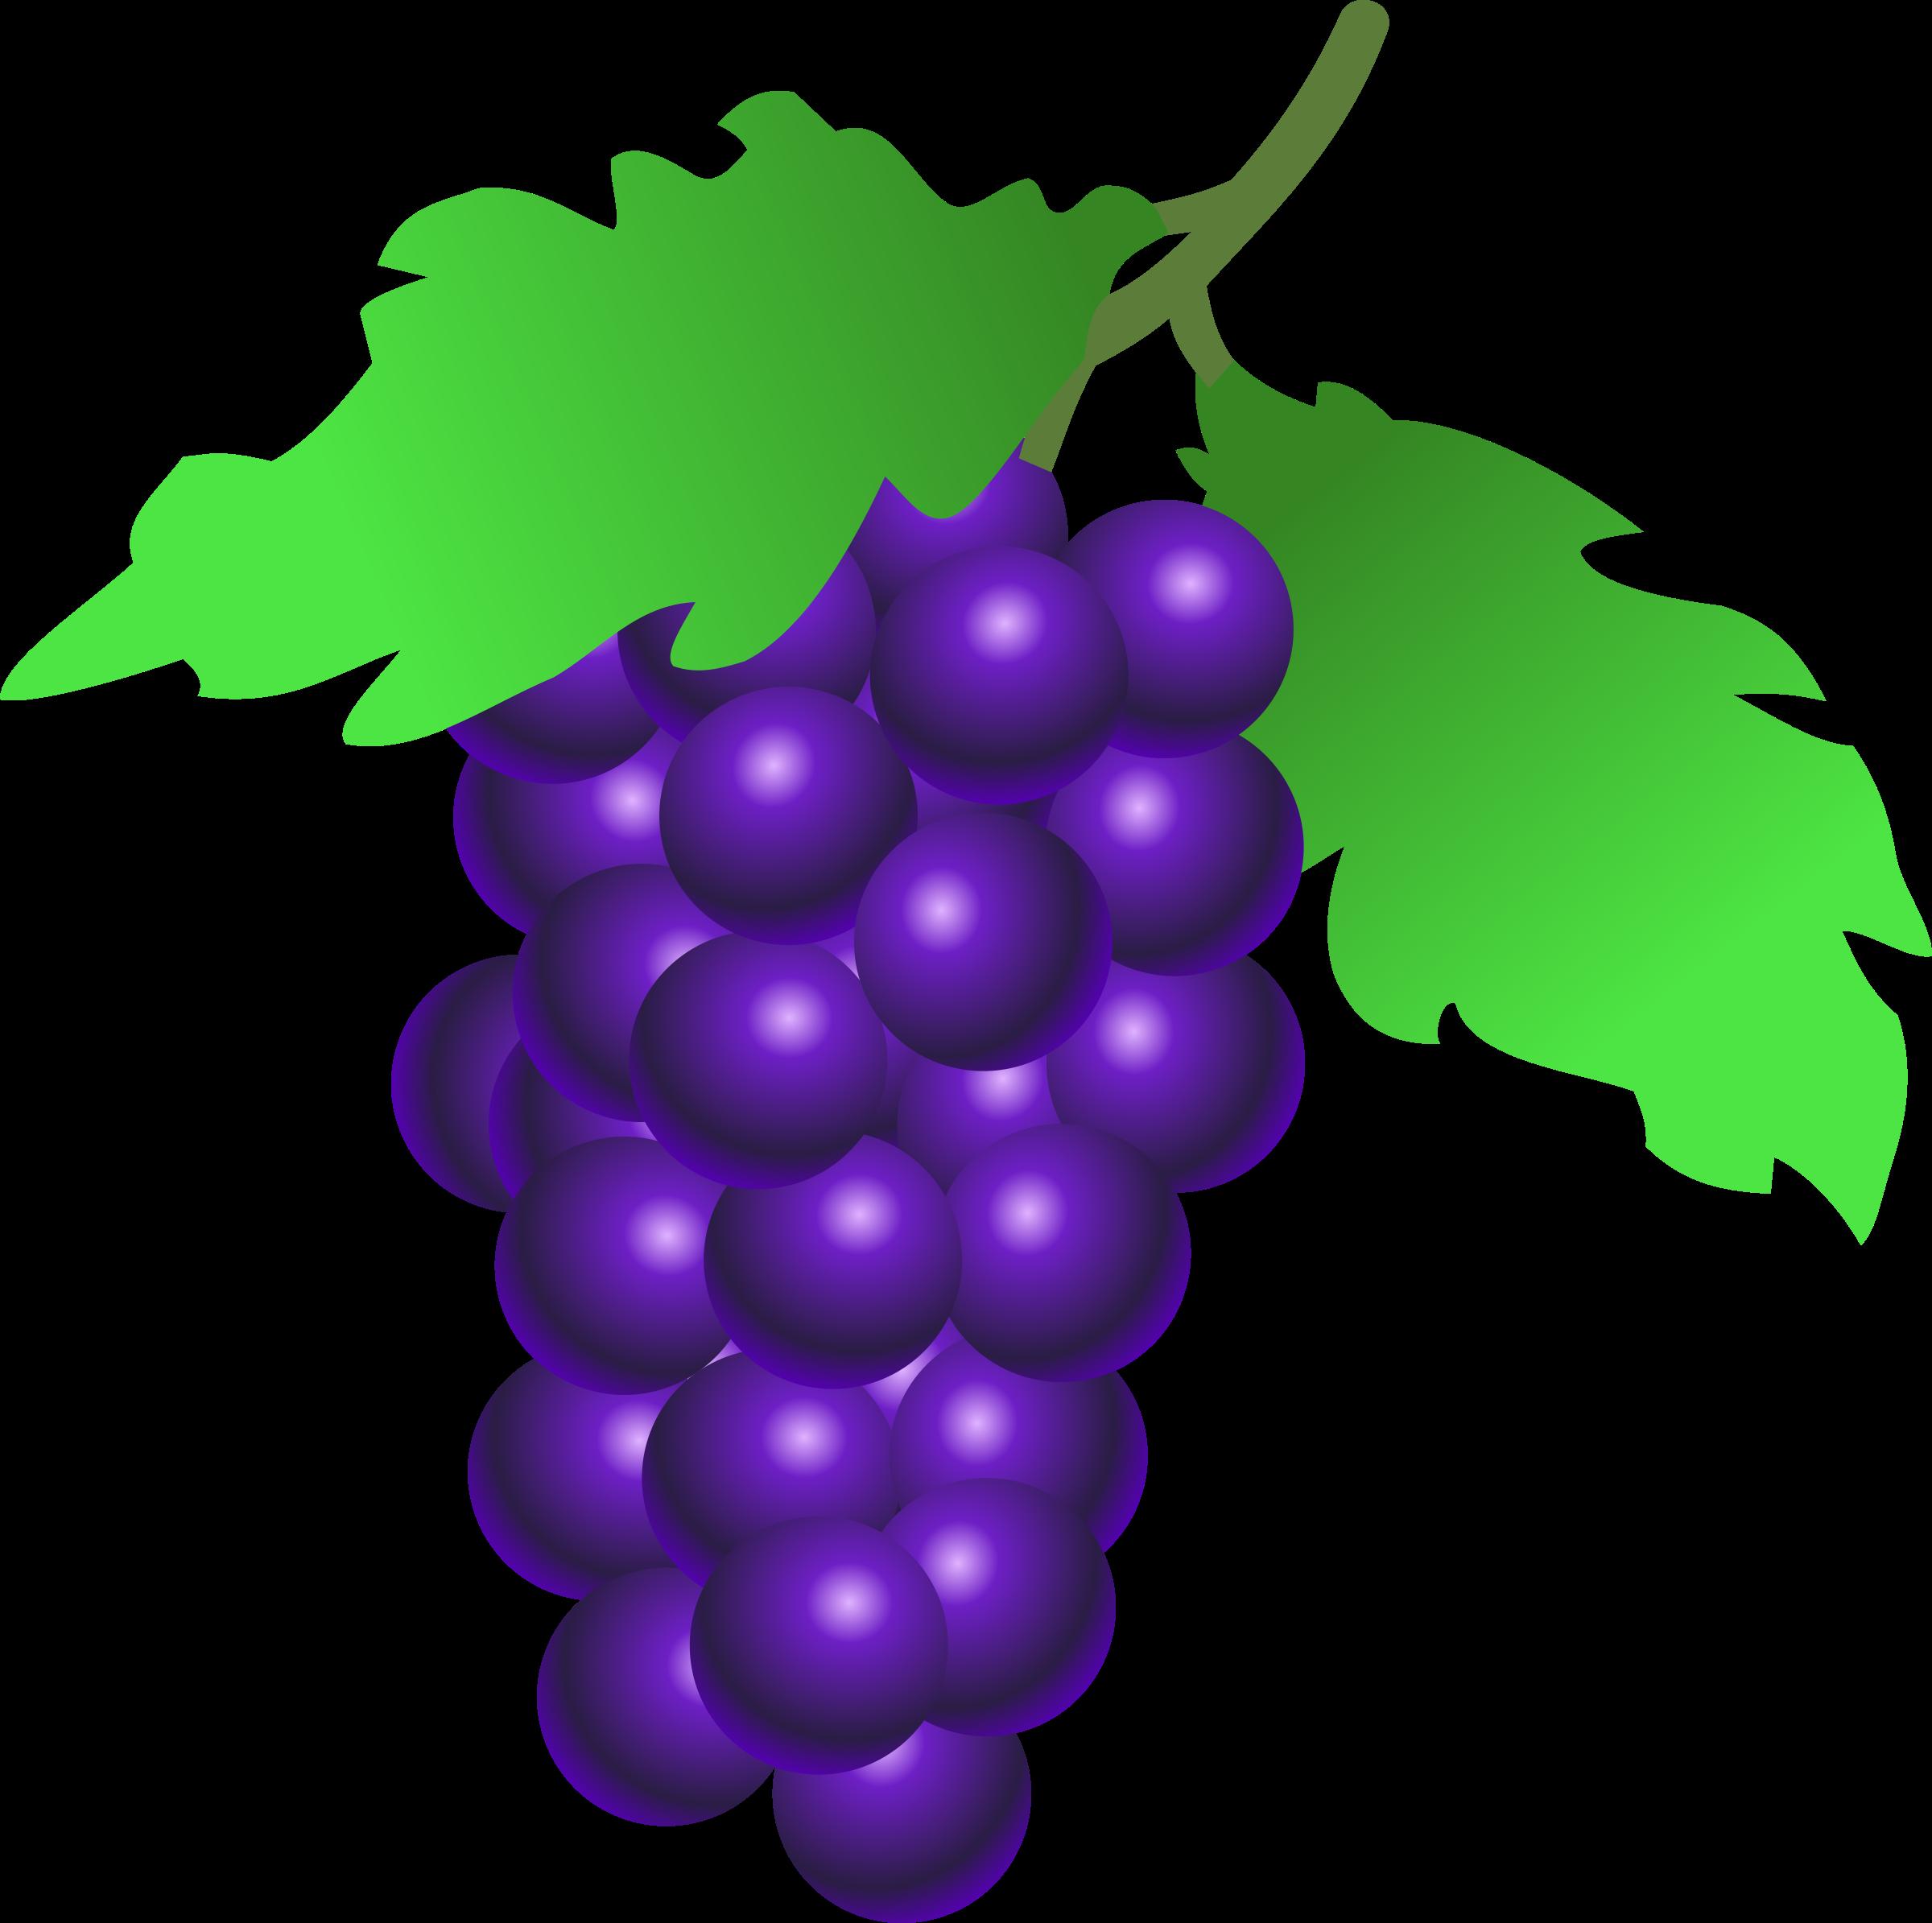 Grape clipart bunch grape. Grapes big image png